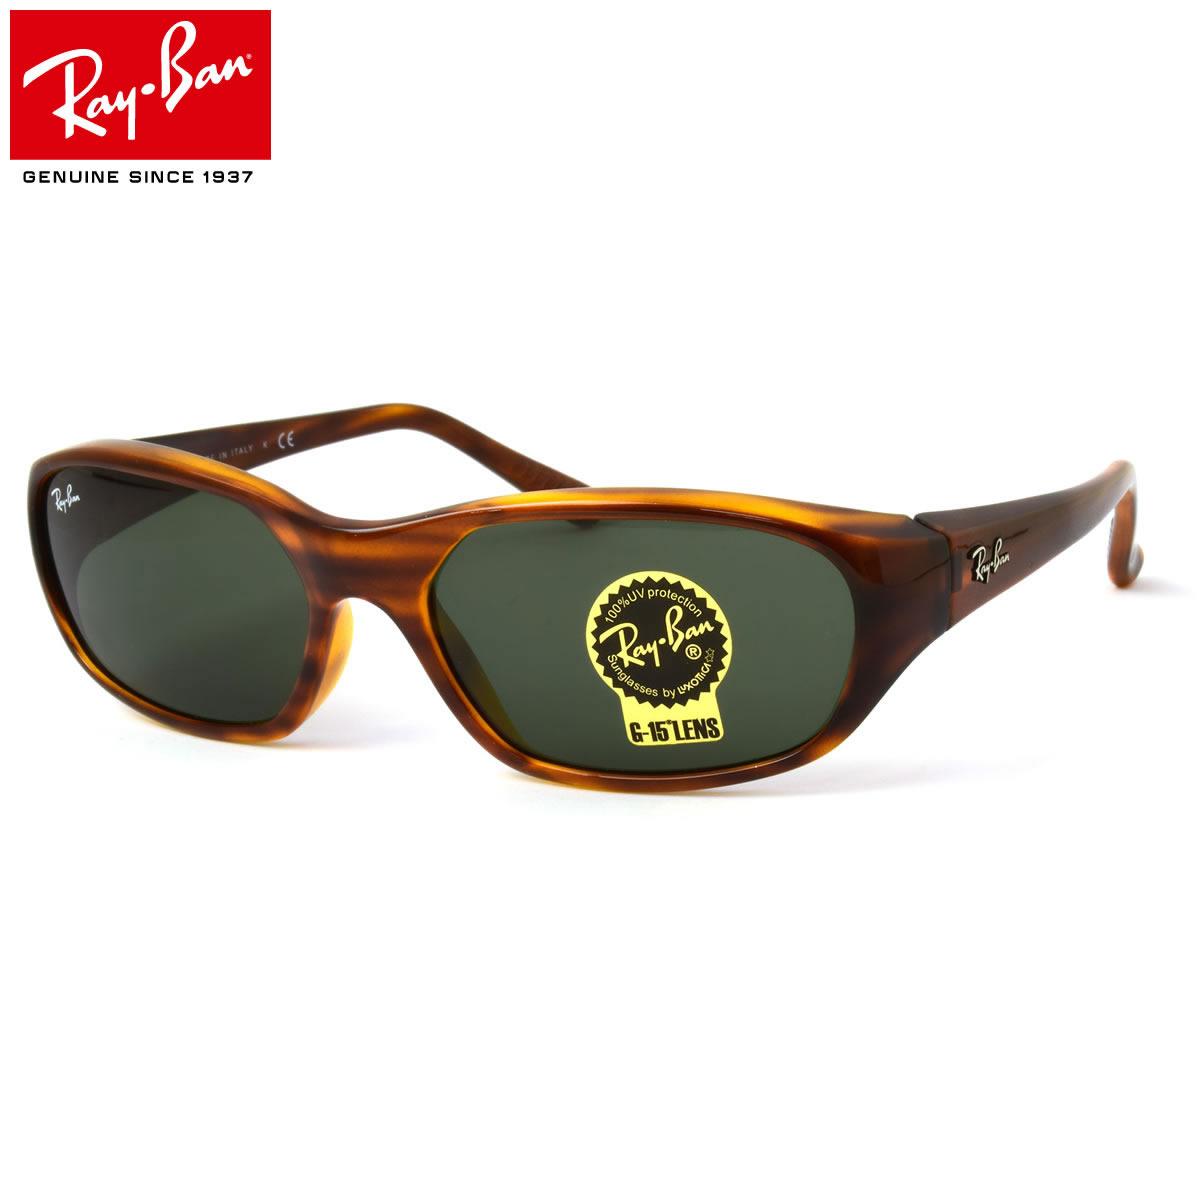 Ray-Ban レイバン サングラス RB2016 820/31 59サイズ DADDY-O ダディーオー メンズ レディース